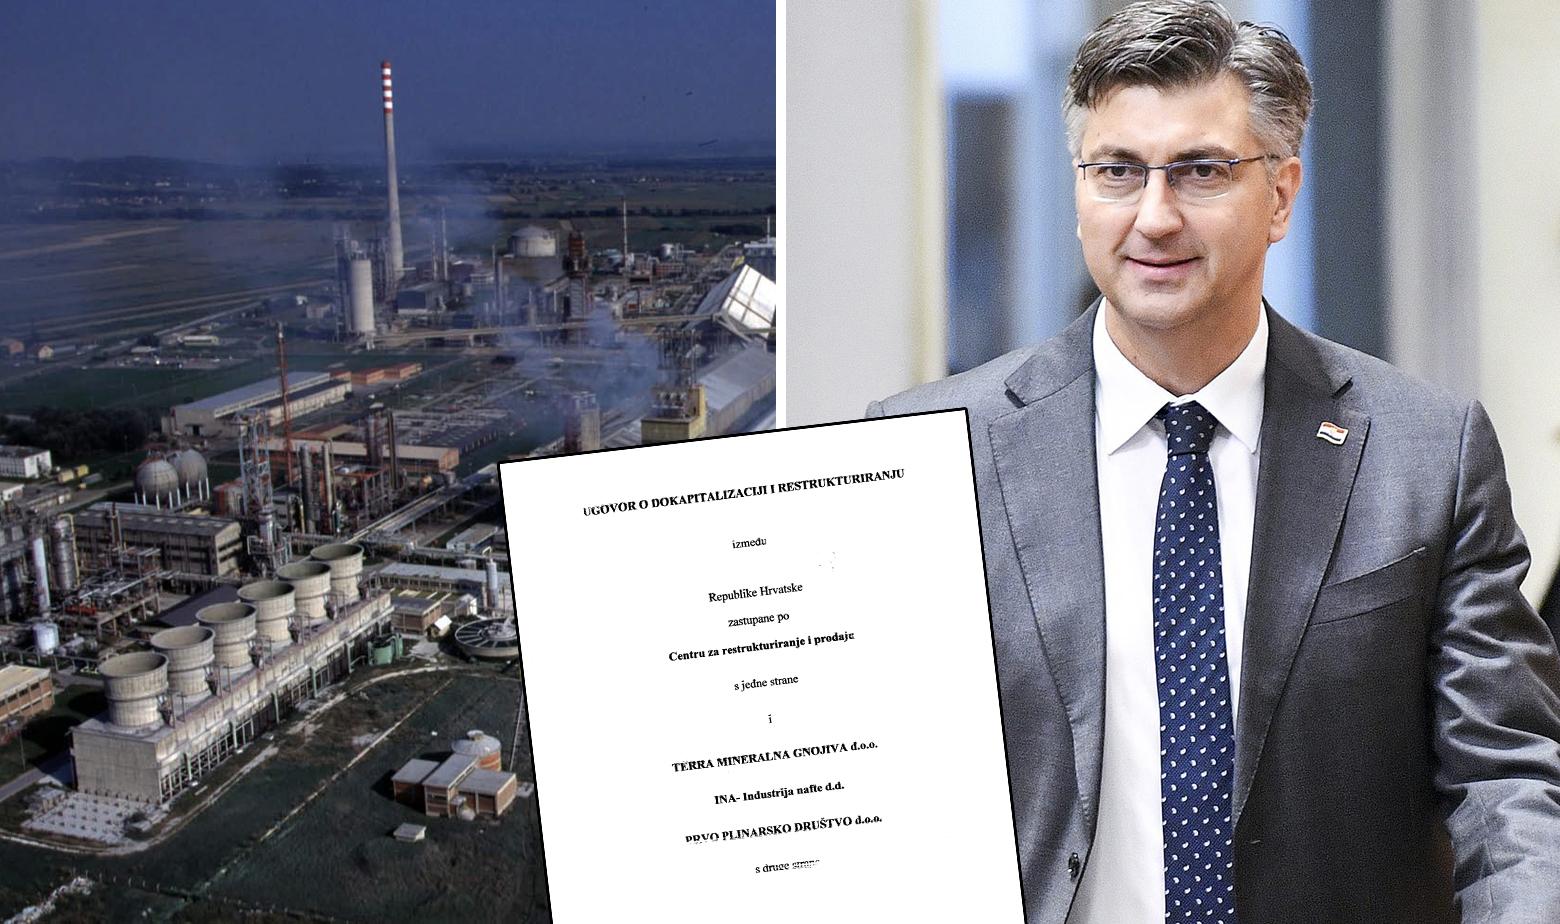 Petrokemija, Andrej Plenković i ugovor o dokapitalizaciji Petrokemije